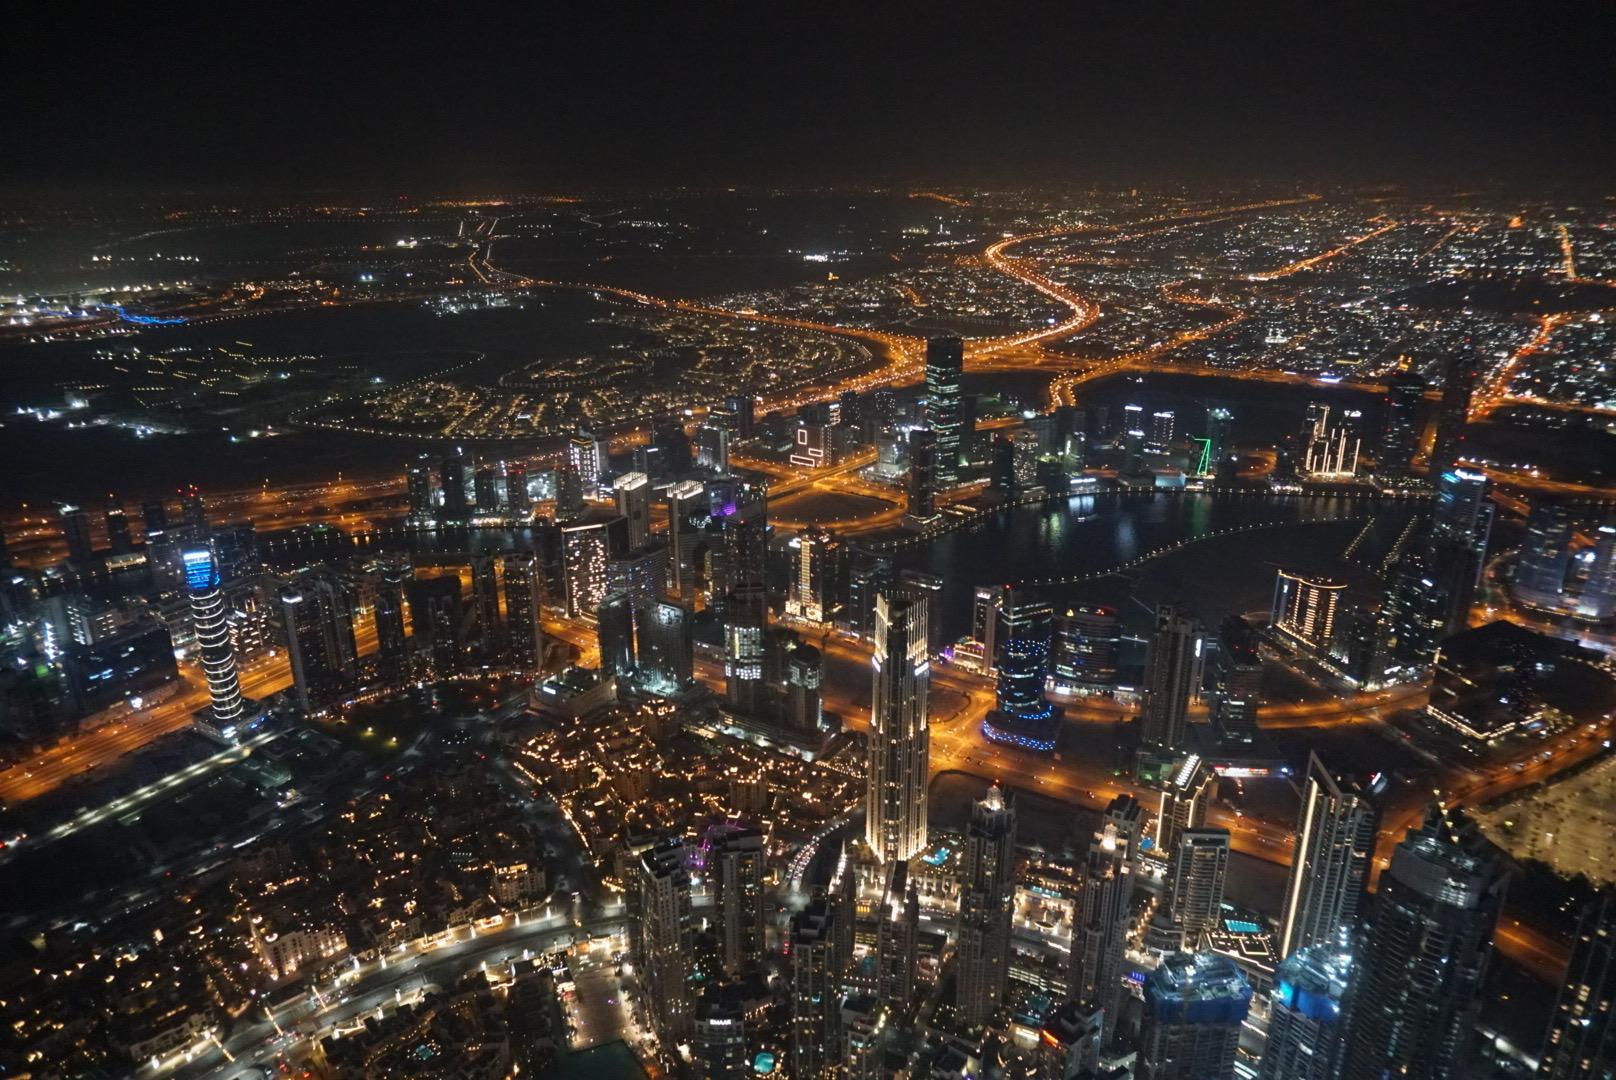 At The Top, Burj Khalifa, downtown Dubai by night